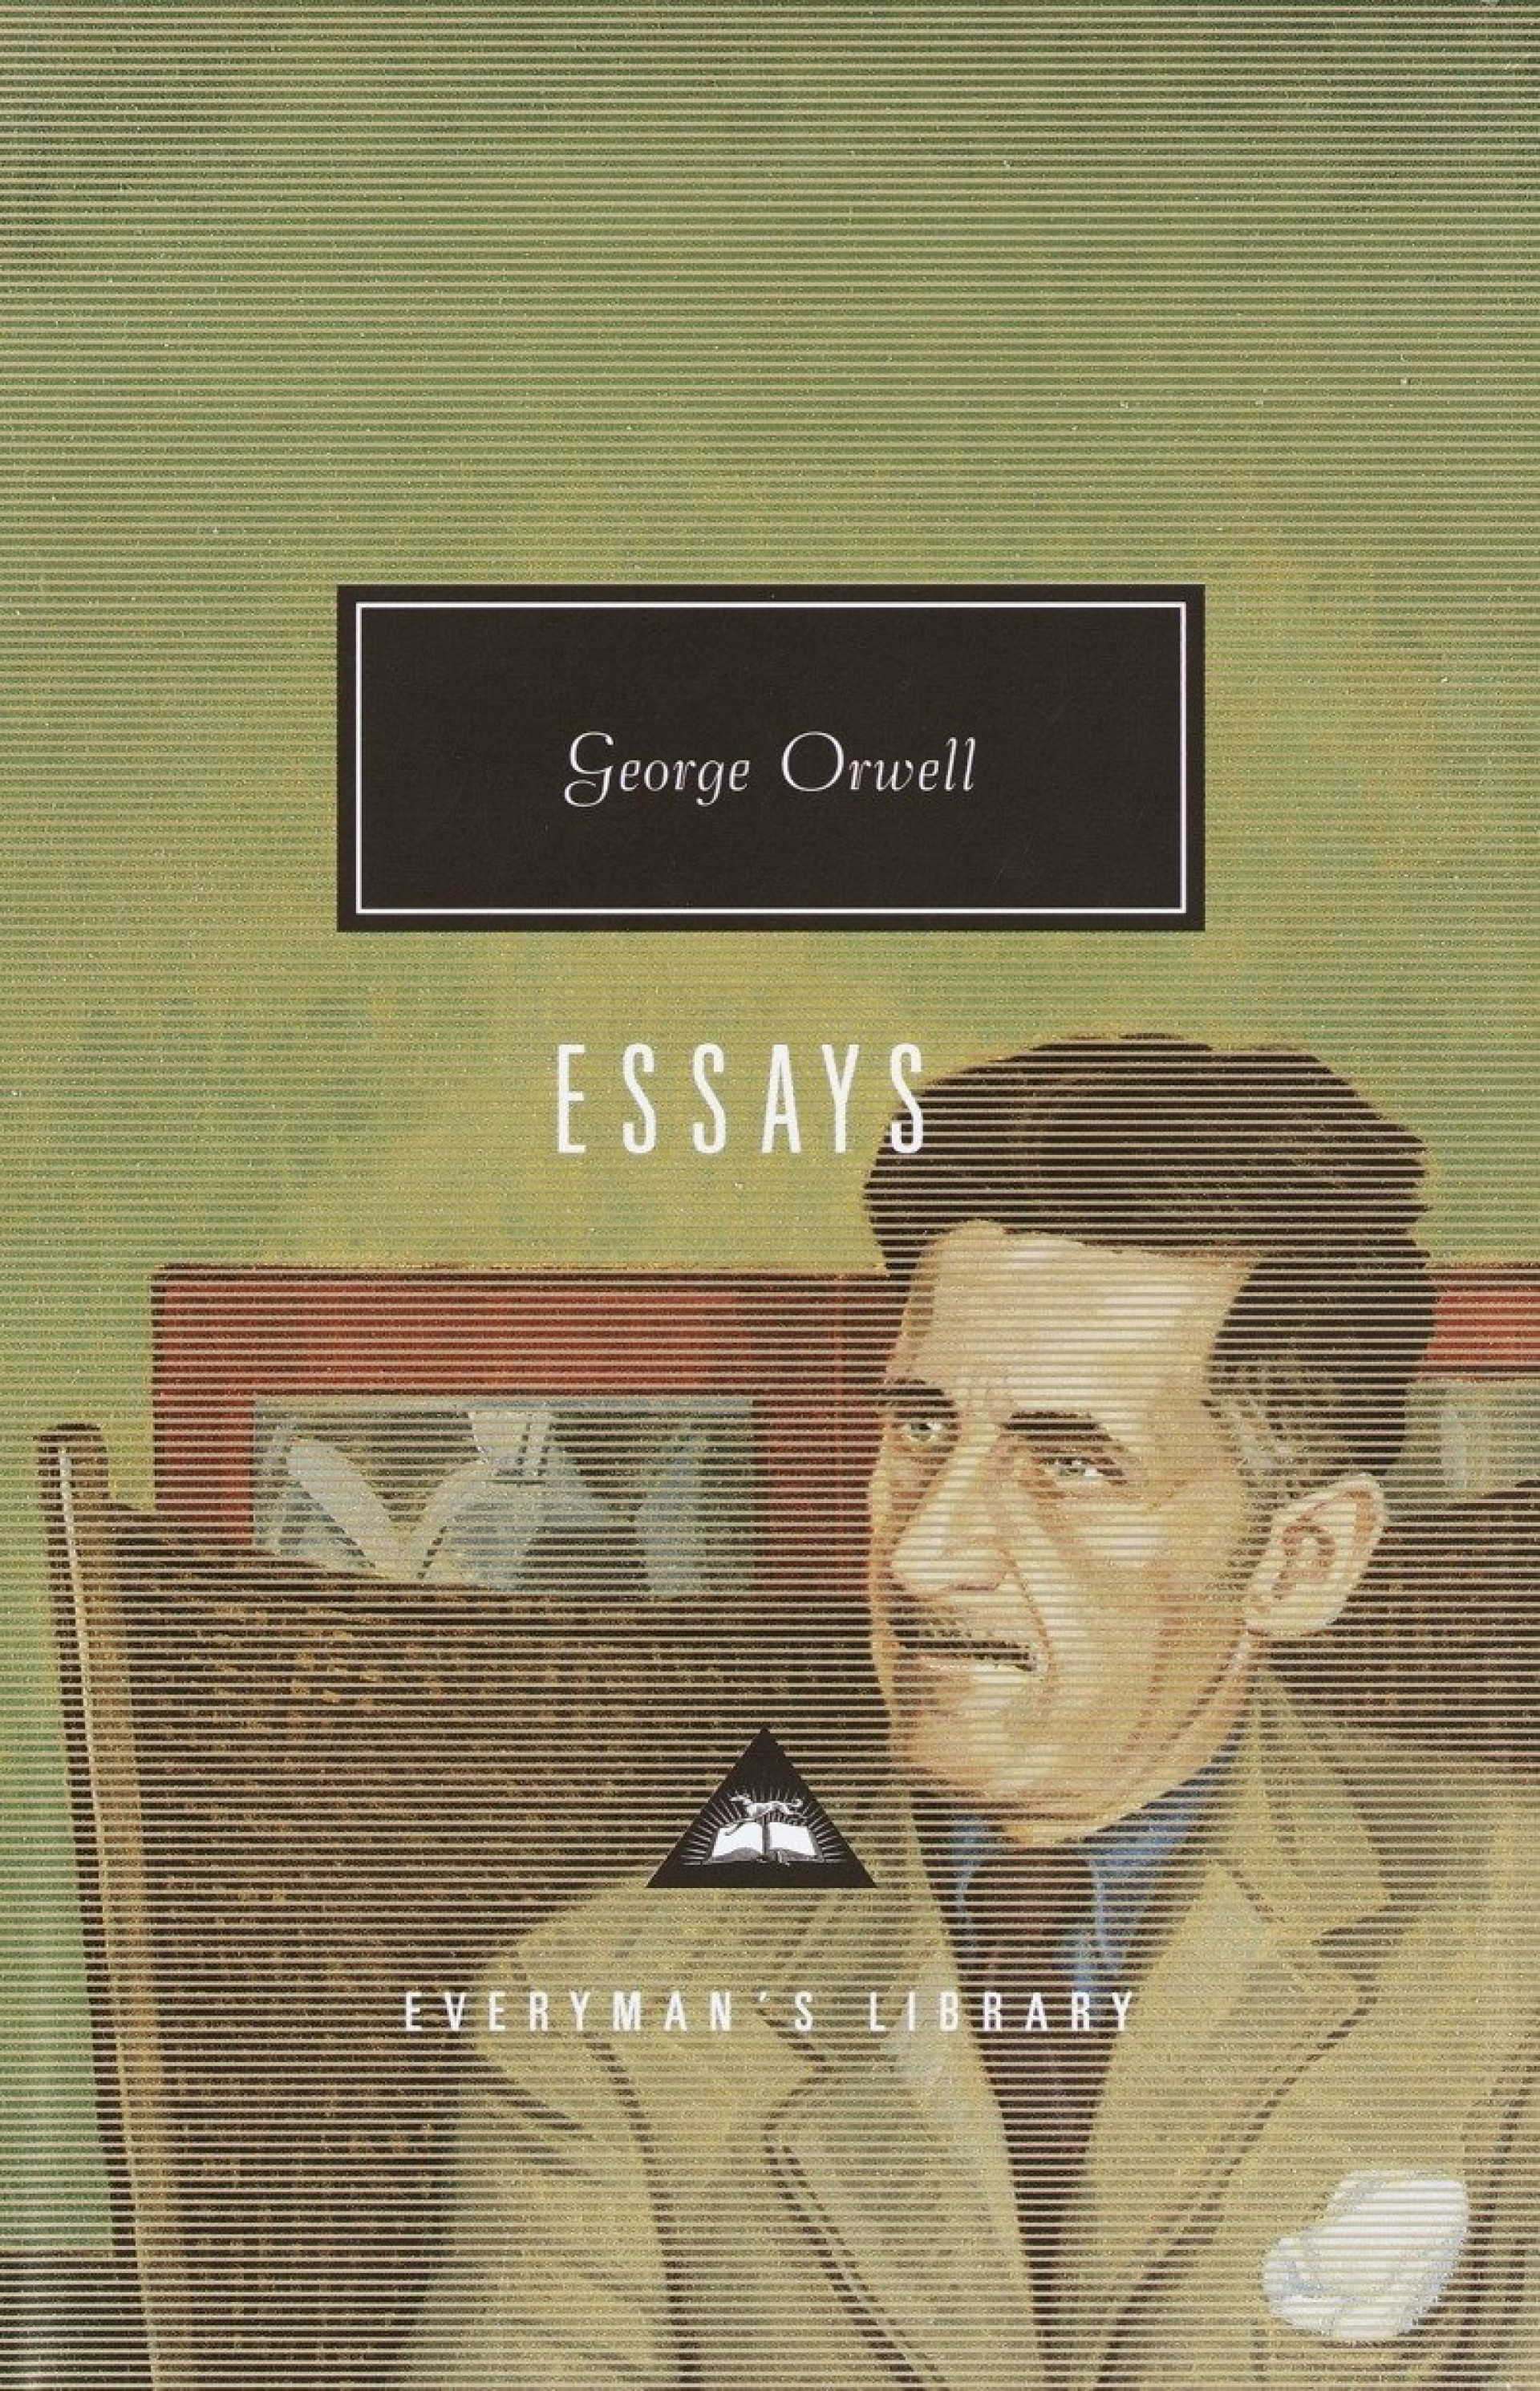 006 81qzb0g1zol Essay Example George Orwell Frightening Essays Everyman's Library Summary Bookshop Memories 1920